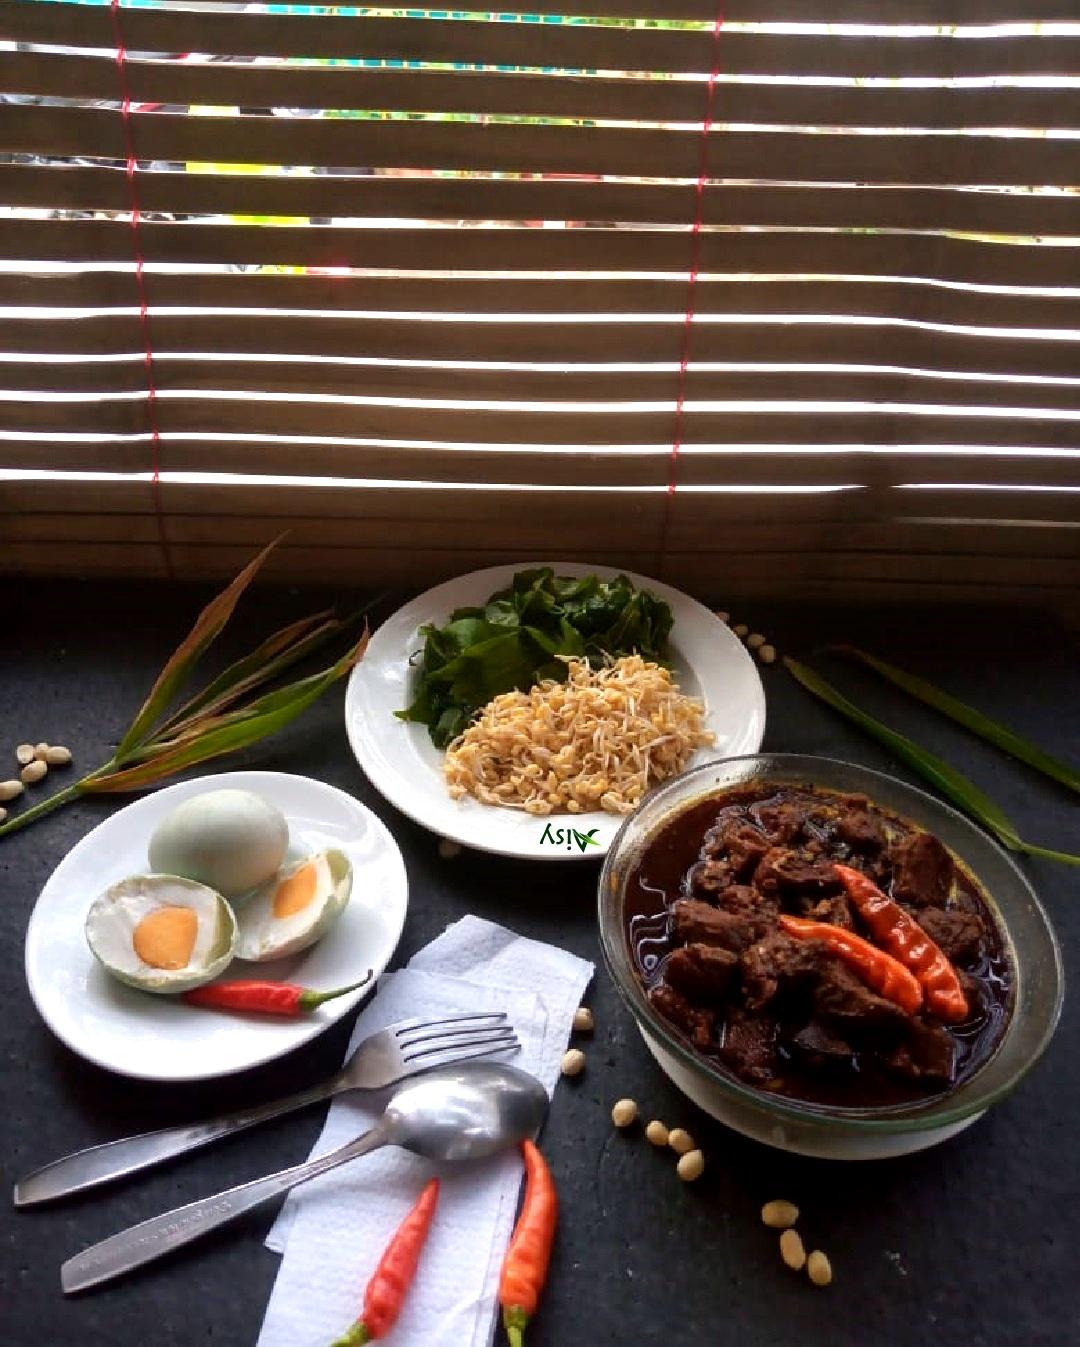 Catering Harian Non MSG : Rawon Daging Sapi + Telur Asin